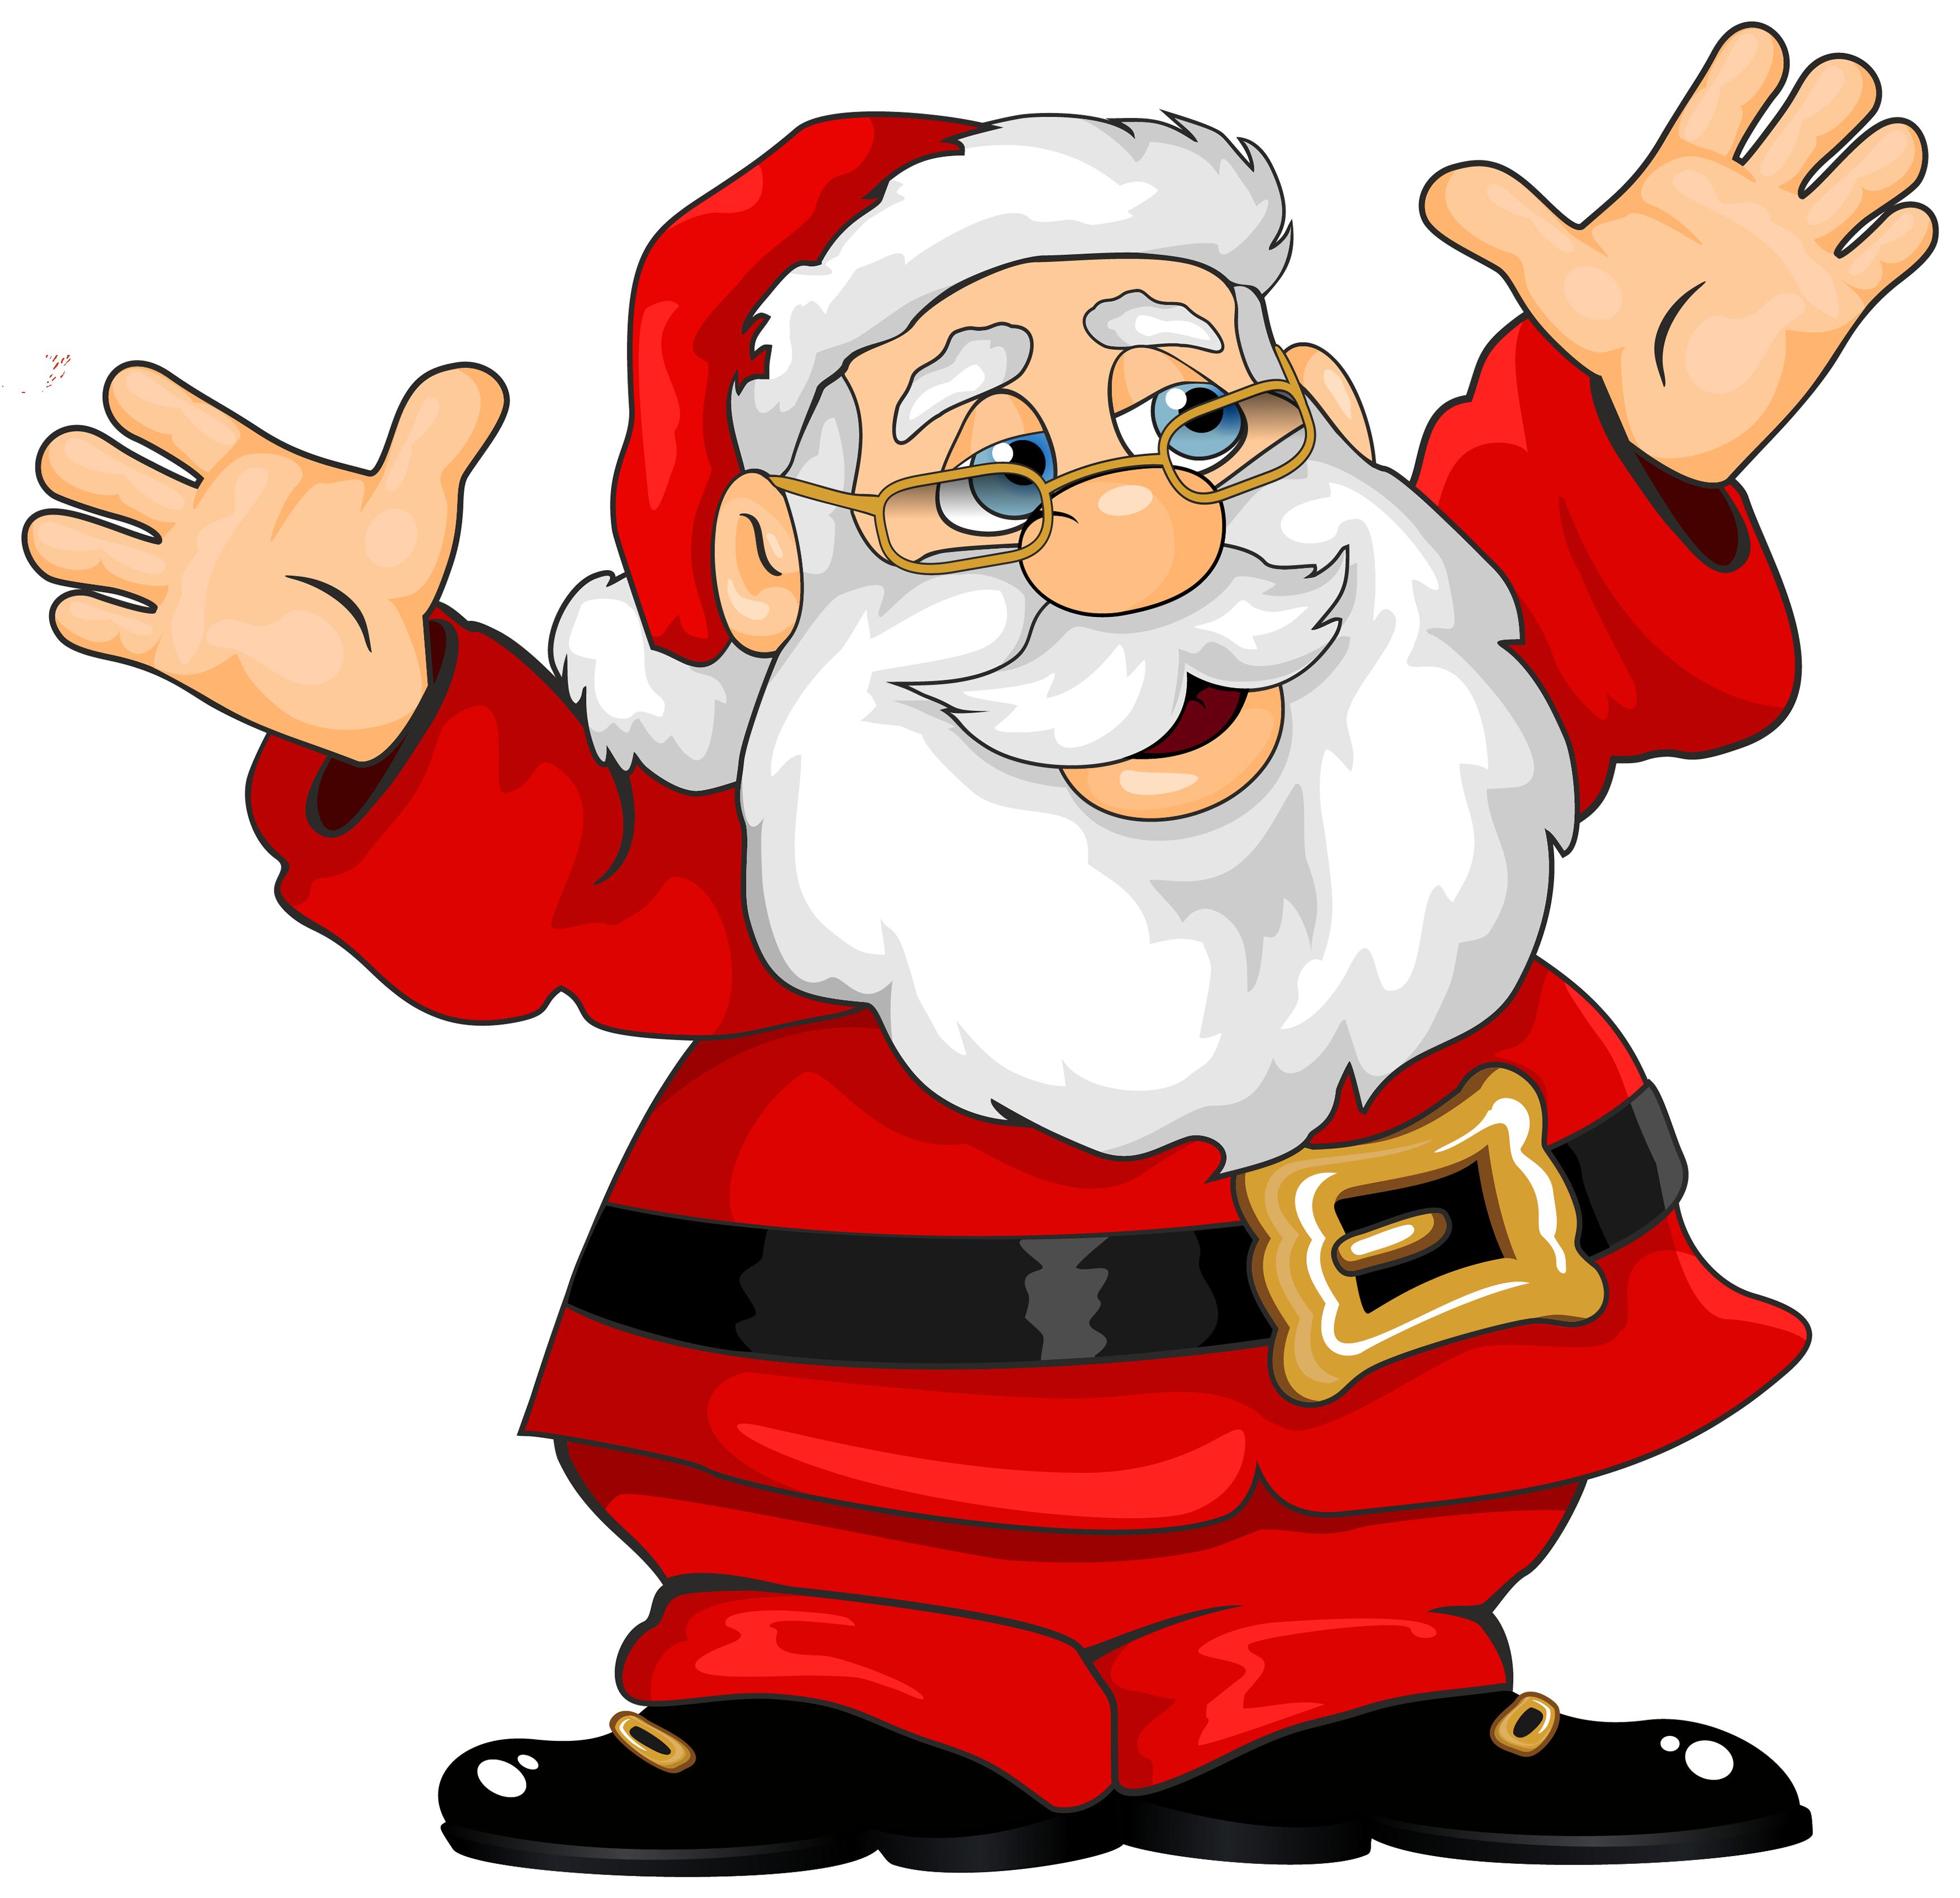 Santa claus png images. Thumb clipart cute